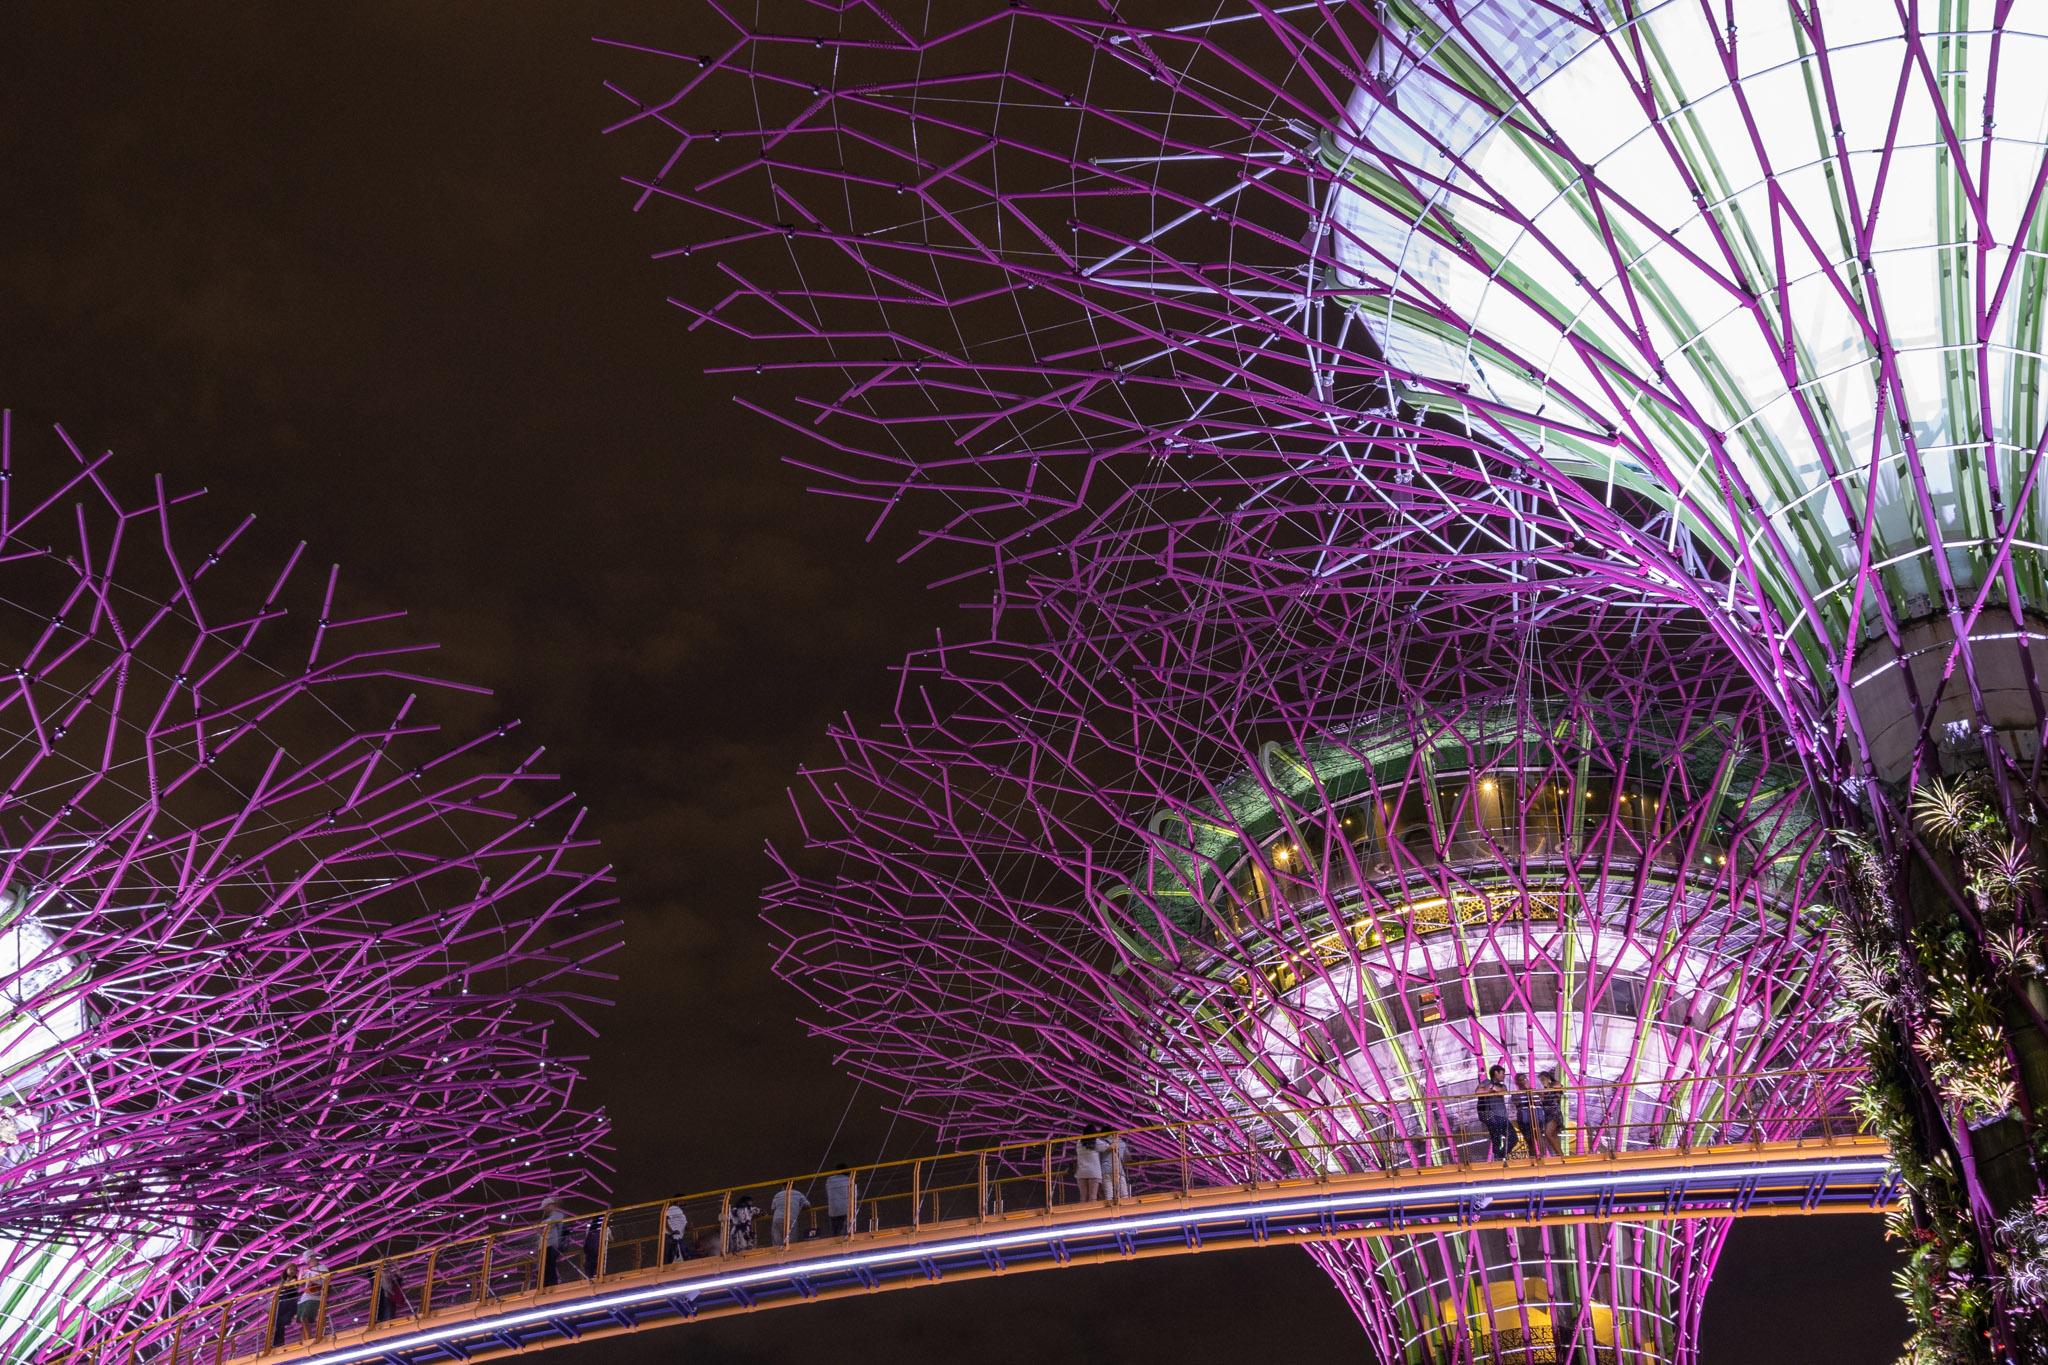 viator-singapore-photographer-tourism-tours-zoo-little-india-gardens-marina-bay-018.jpg